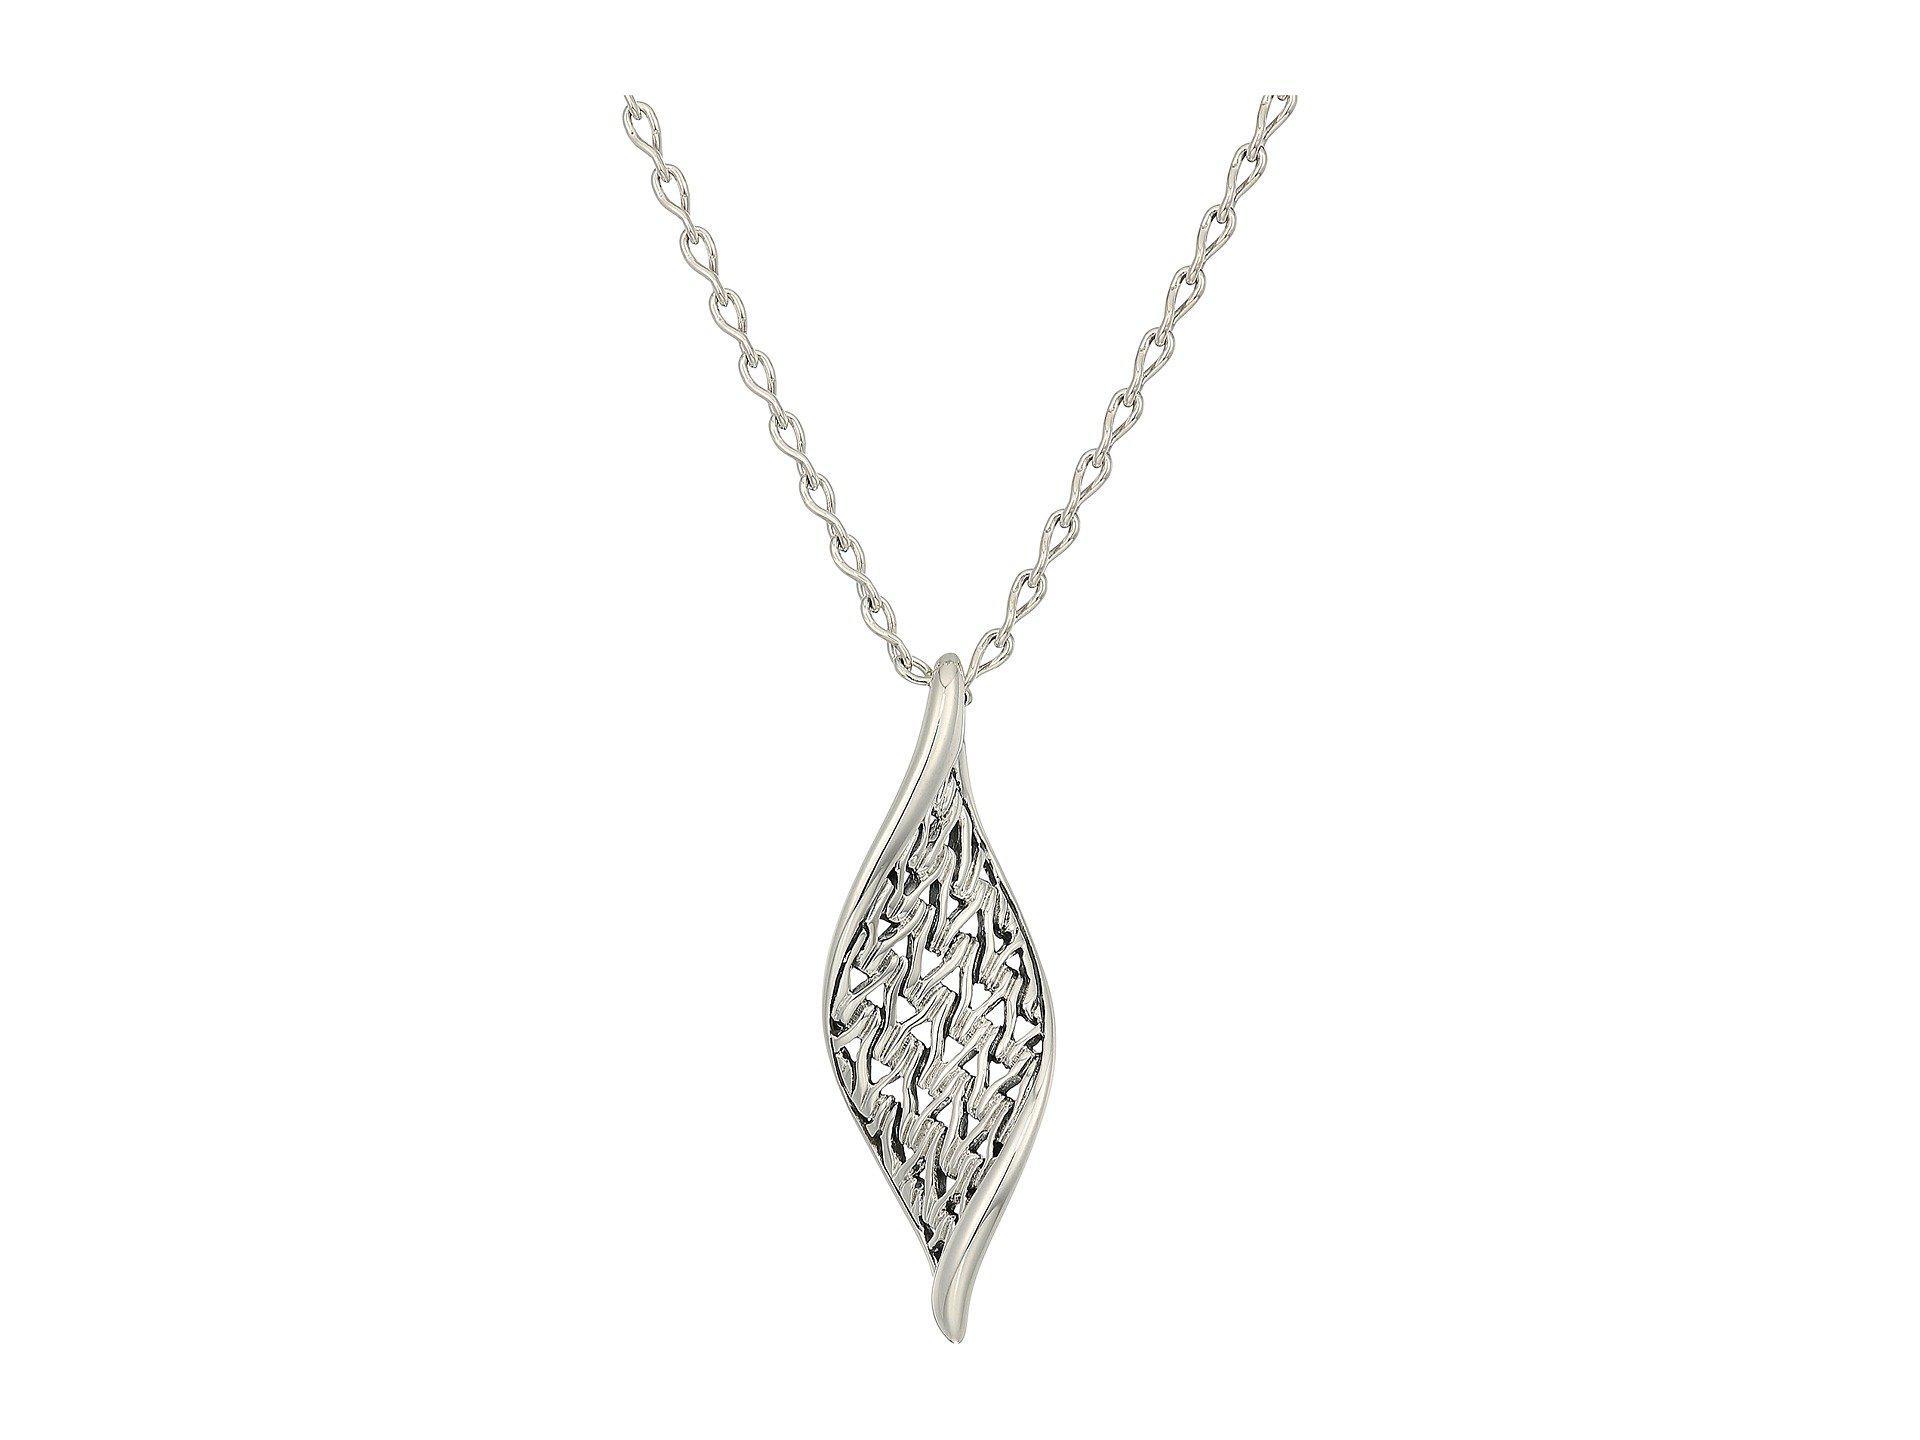 1735e3f20f0b8 Lyst - John Hardy Classic Chain Wave Pendant Necklace (silver ...